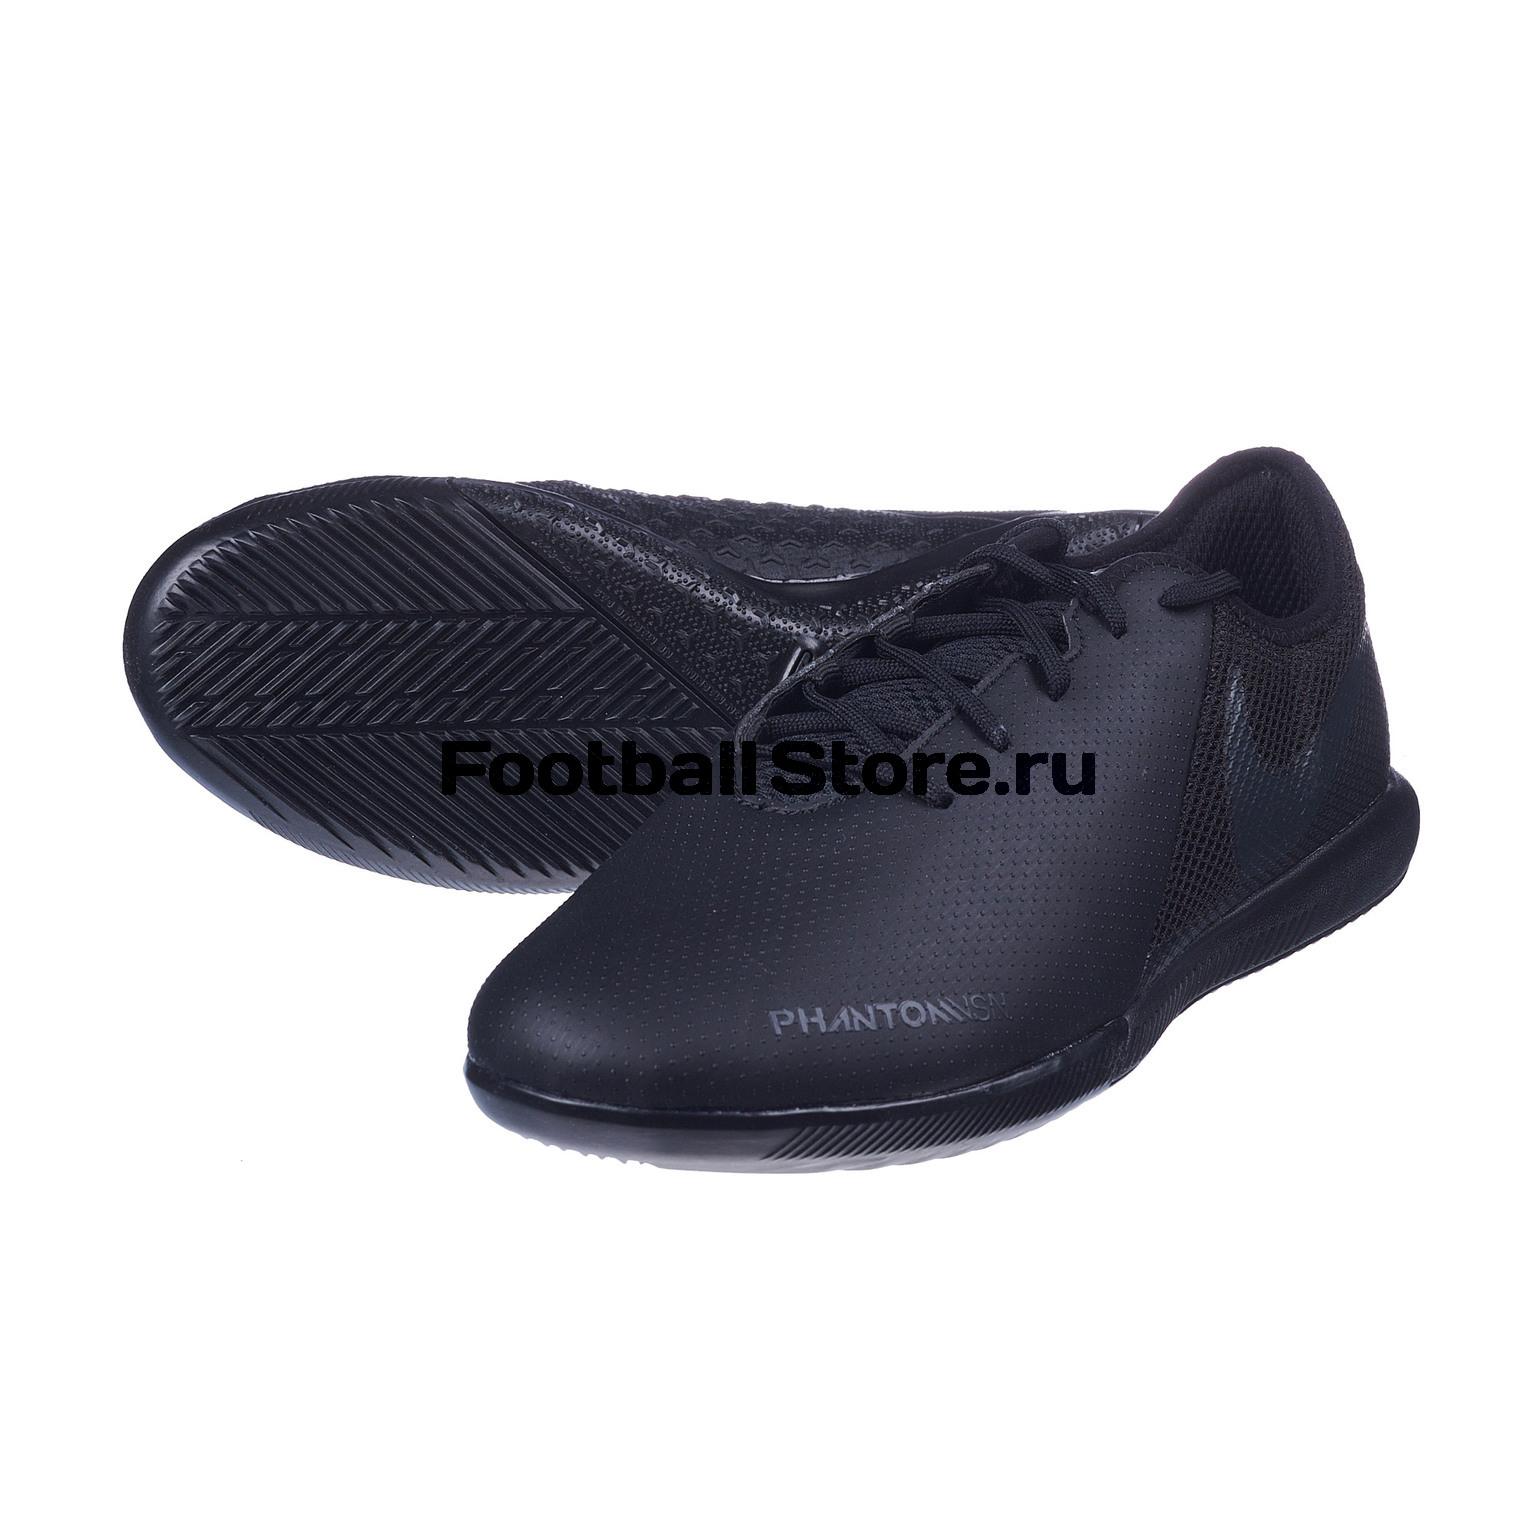 Футзалки Nike Phantom Vision Academy IC AO3225-001 цена и фото